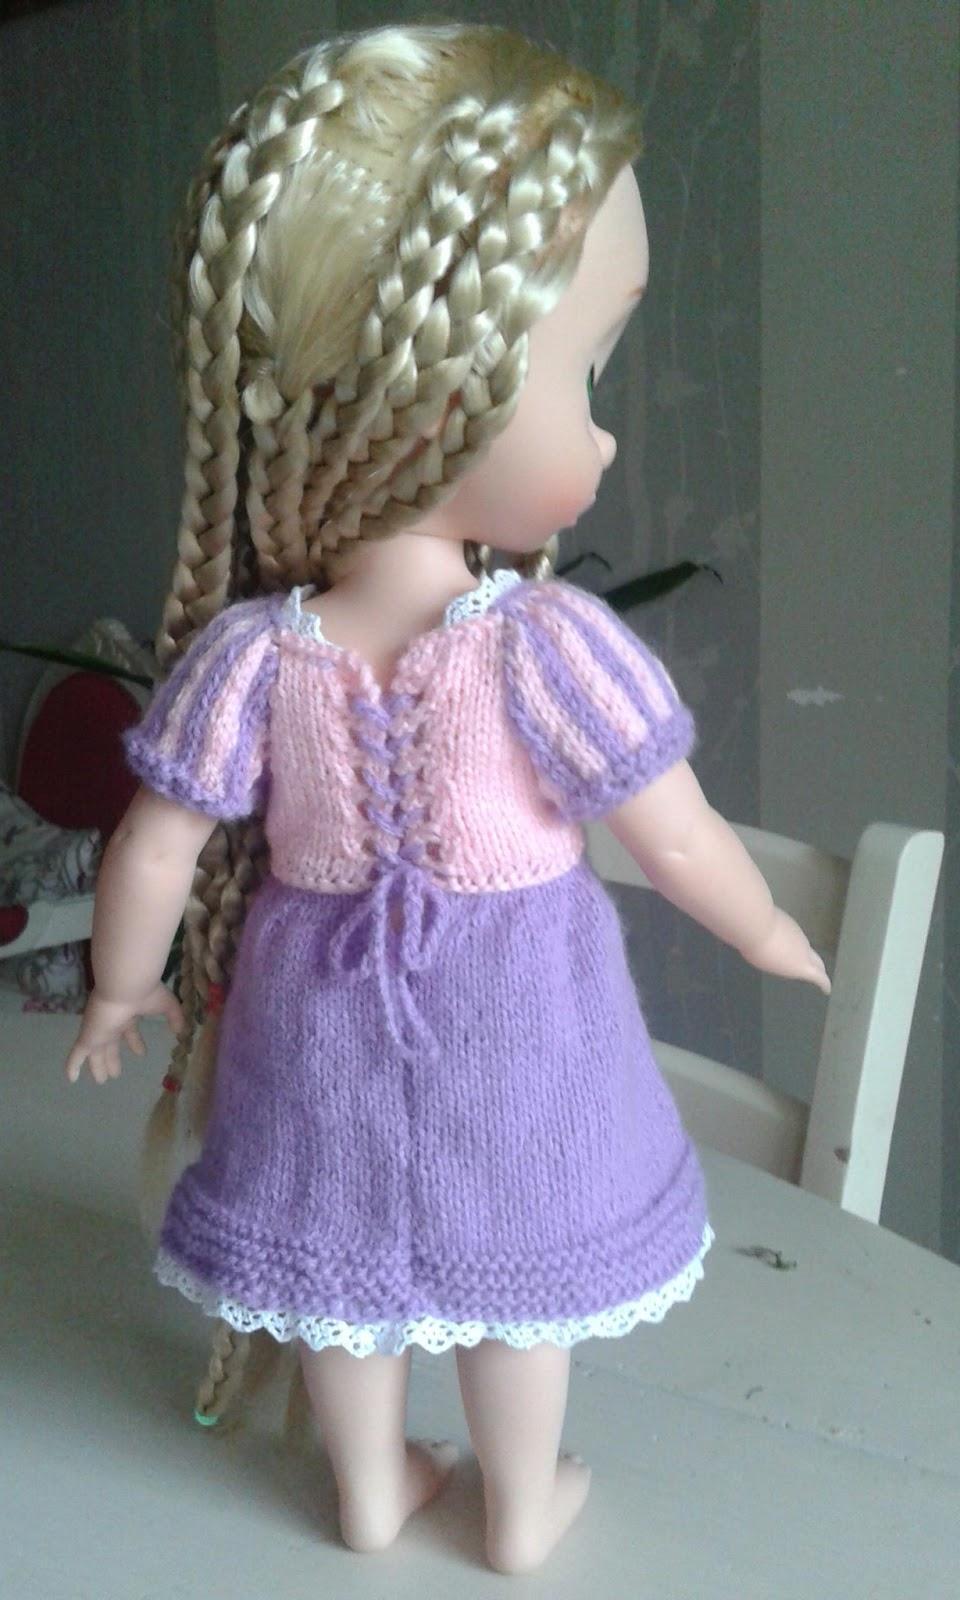 Coco couture tricot broderie tape 2 pour raiponce la petite robe - Raiponce petite ...